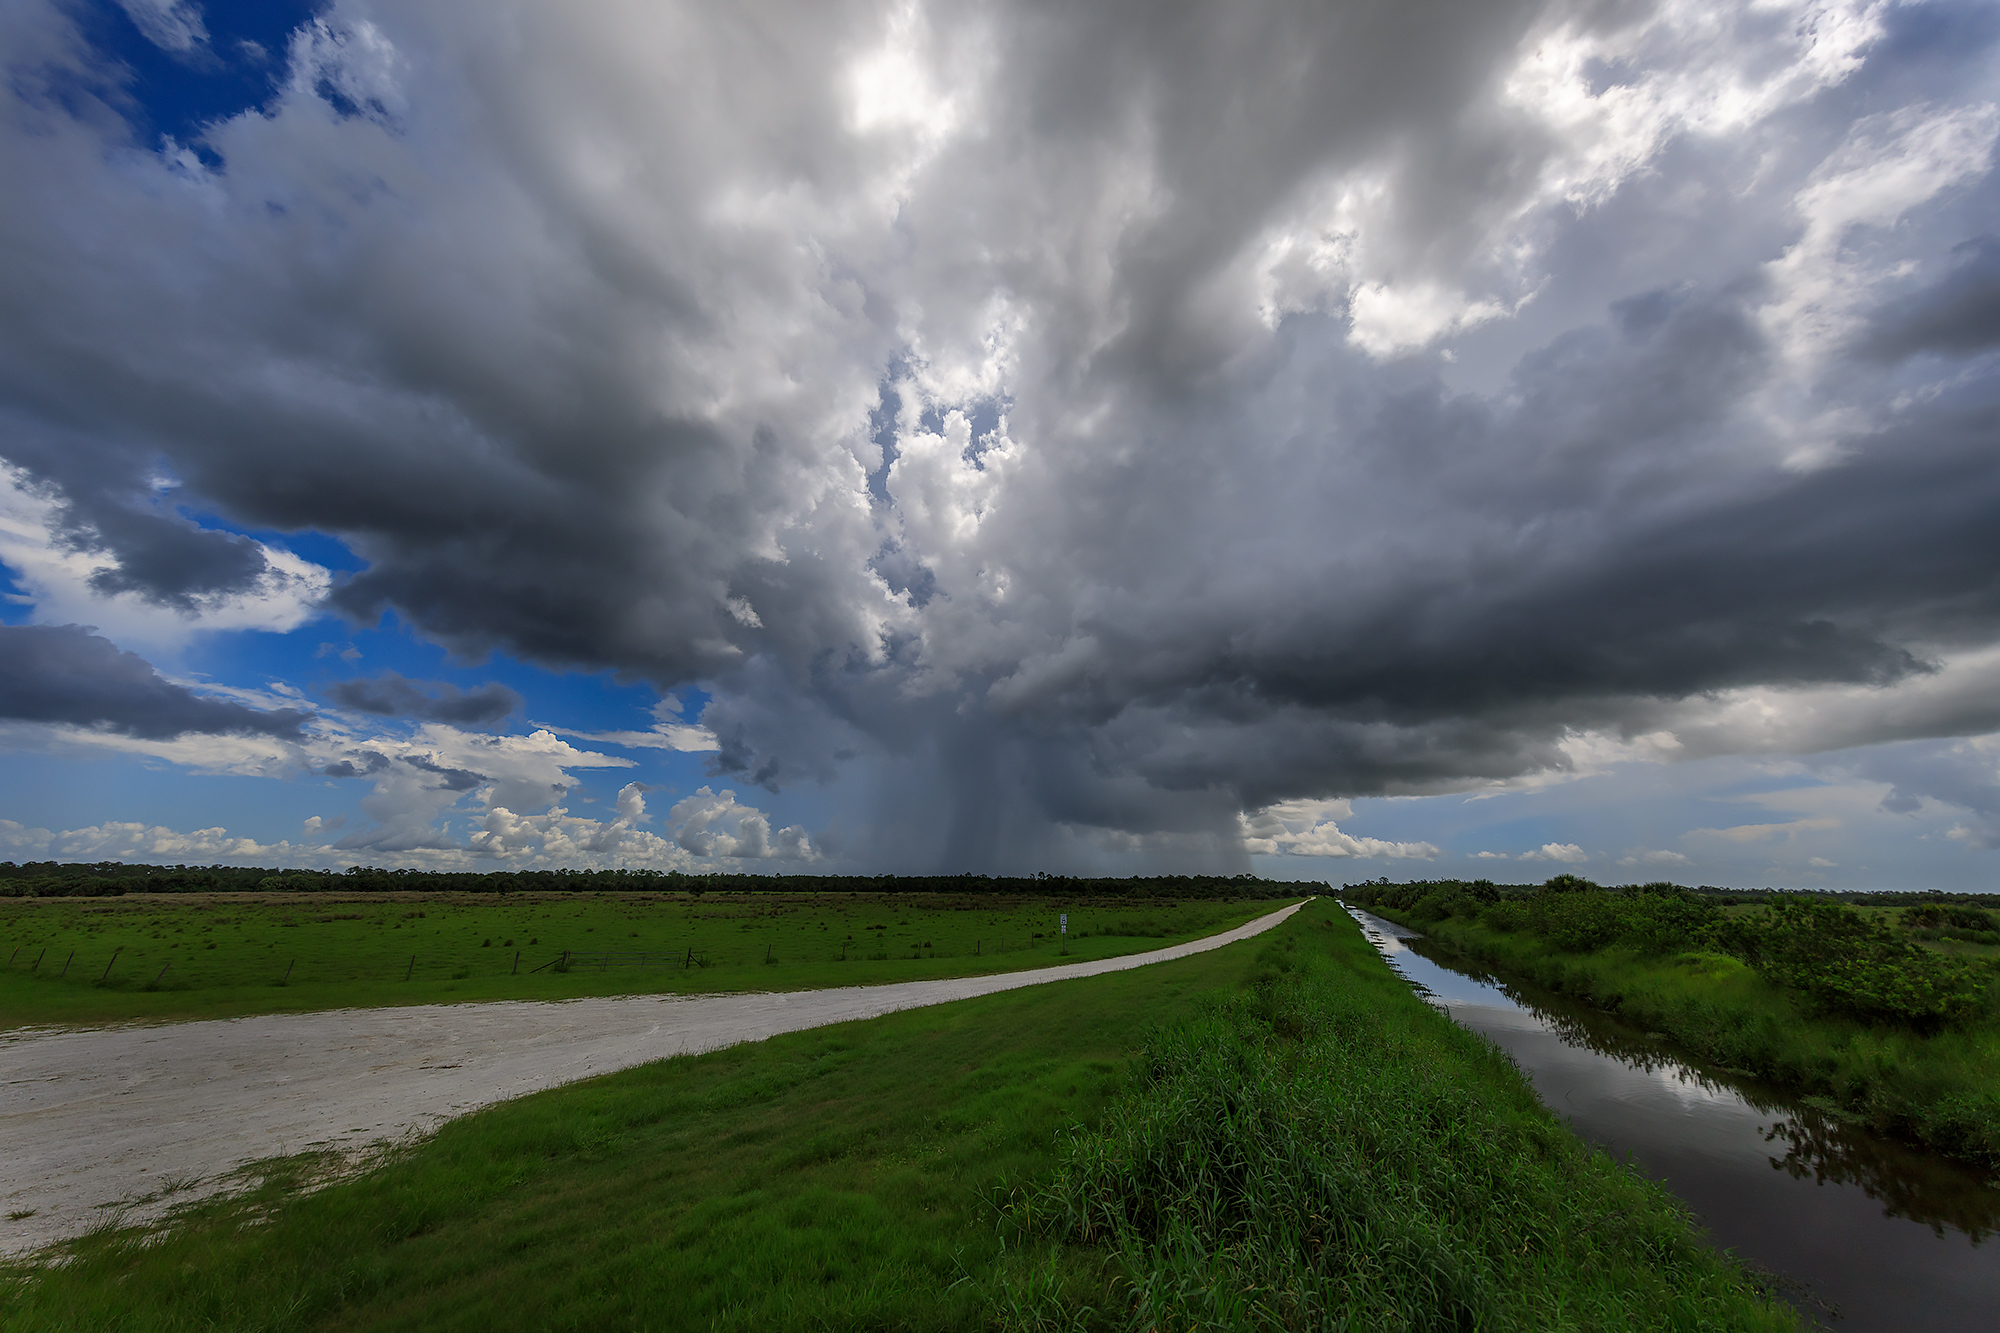 Summer Storm, Moccasin Island Tract, Florida